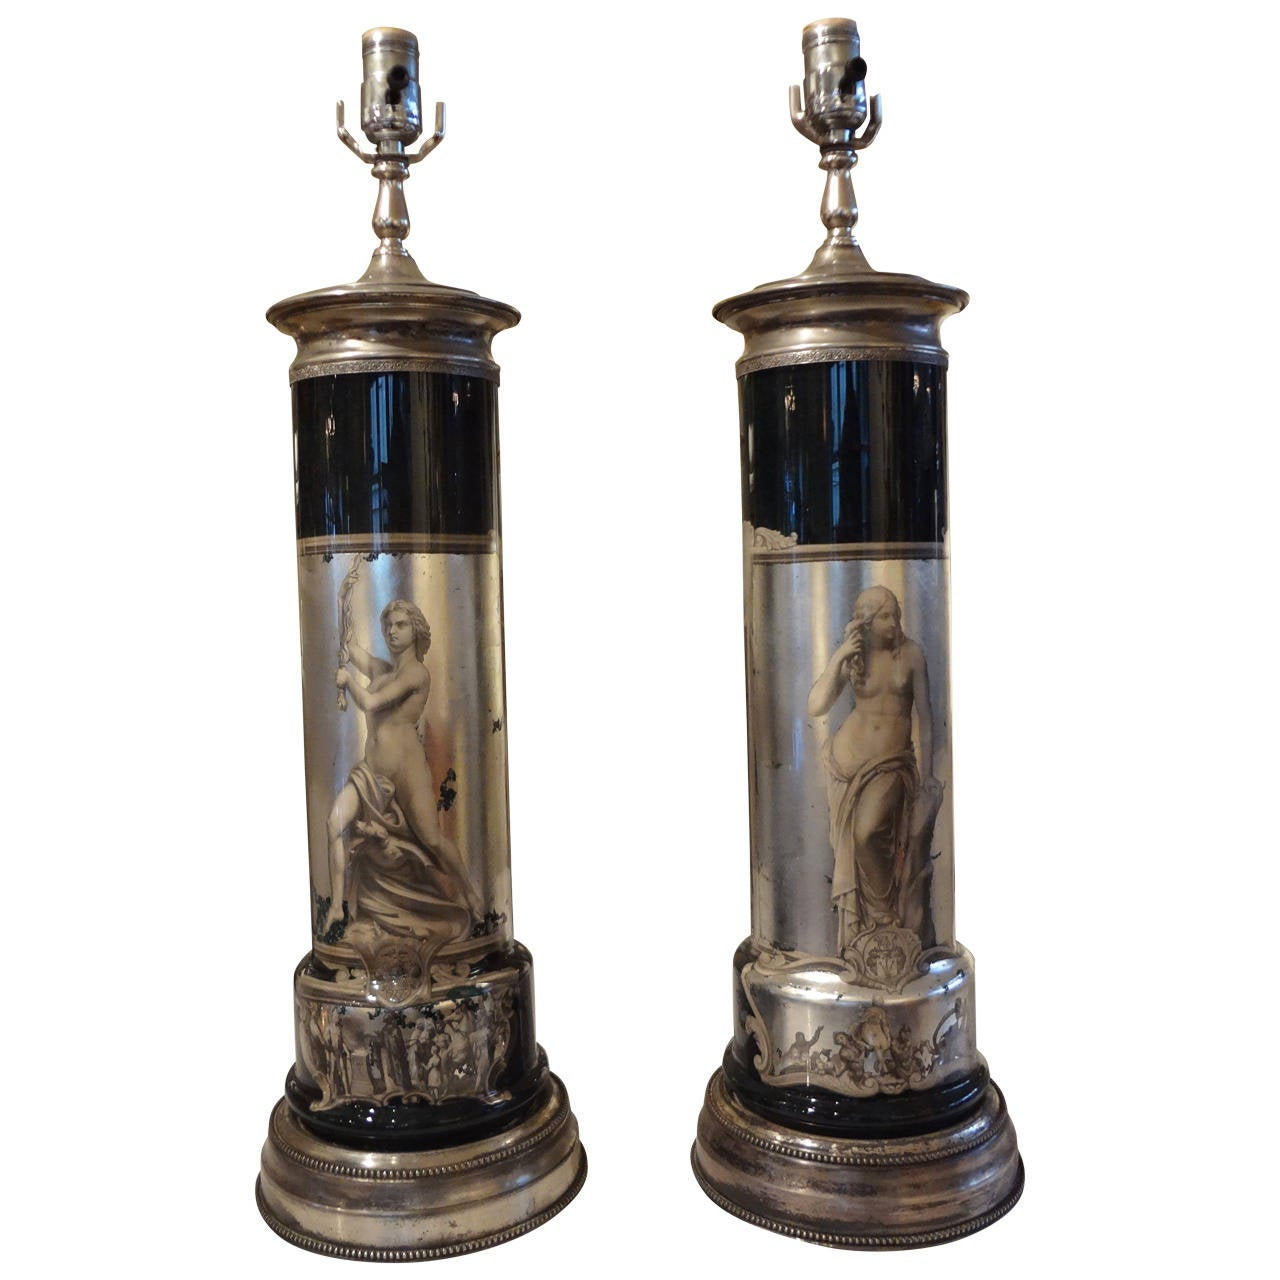 Pair of Italian Neoclassical Fornasetti Style Églomisé Lamps-SATURDAY SALE